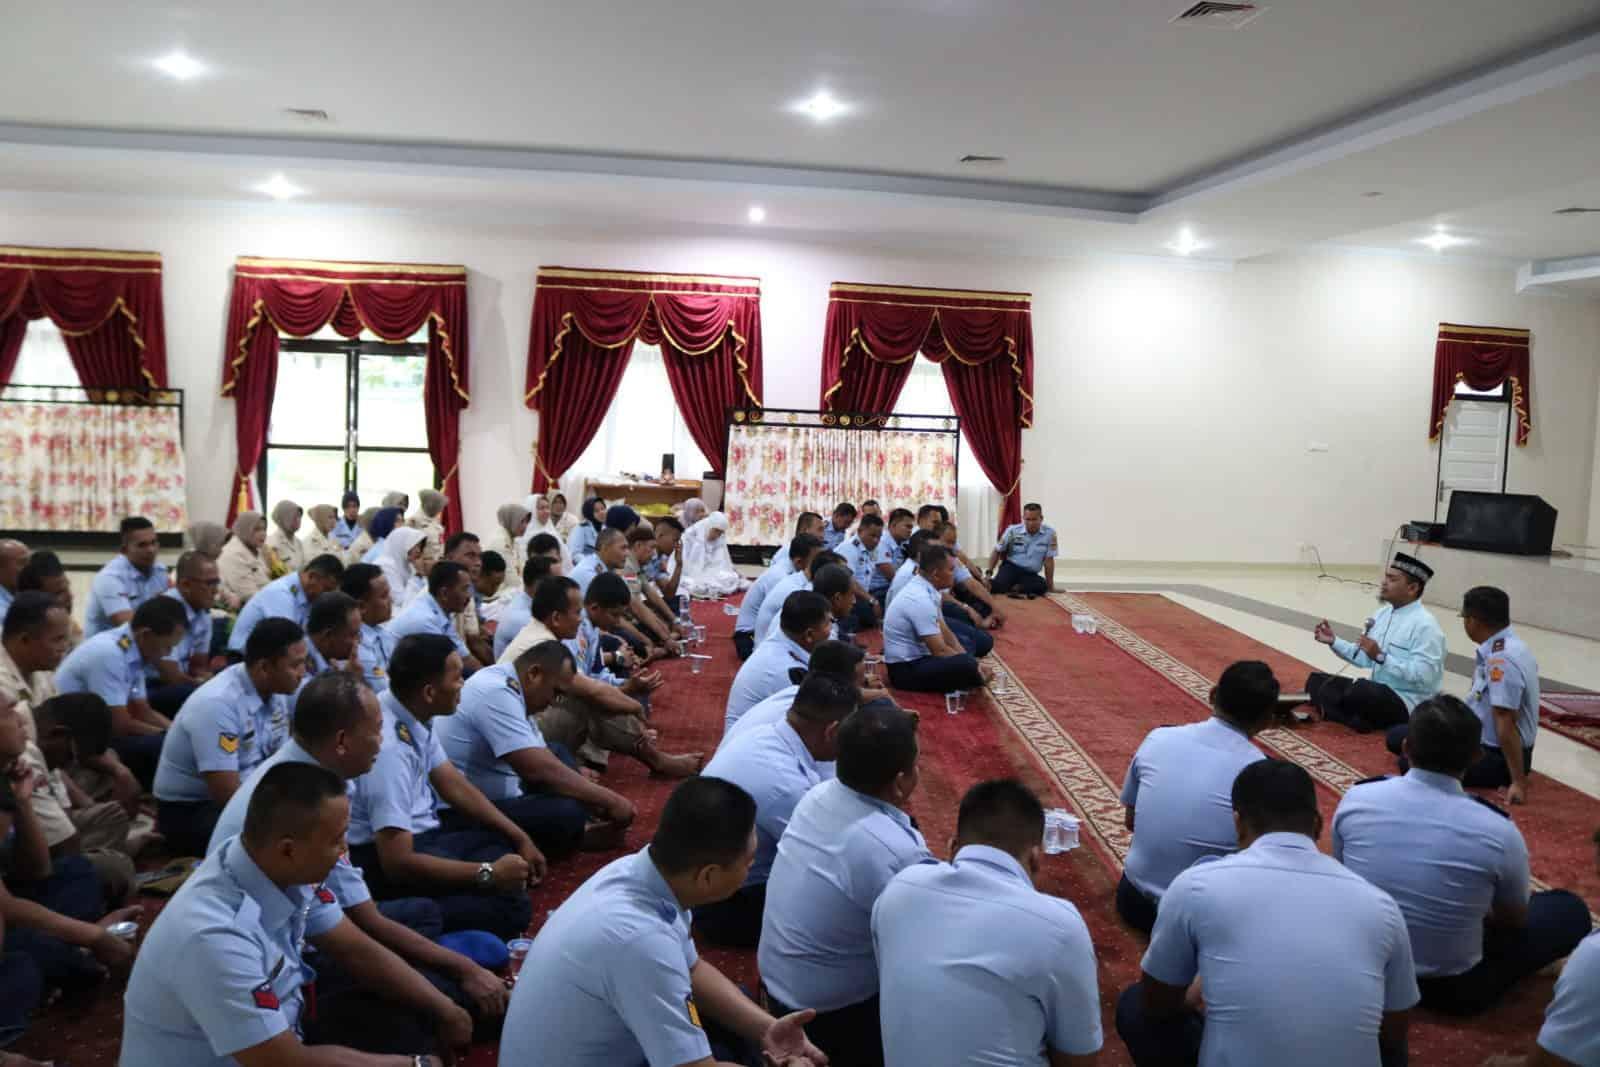 Personel Kosekhanudnas III Tingkatkan Kualitas Iman Melalui Pembinaan Rohani